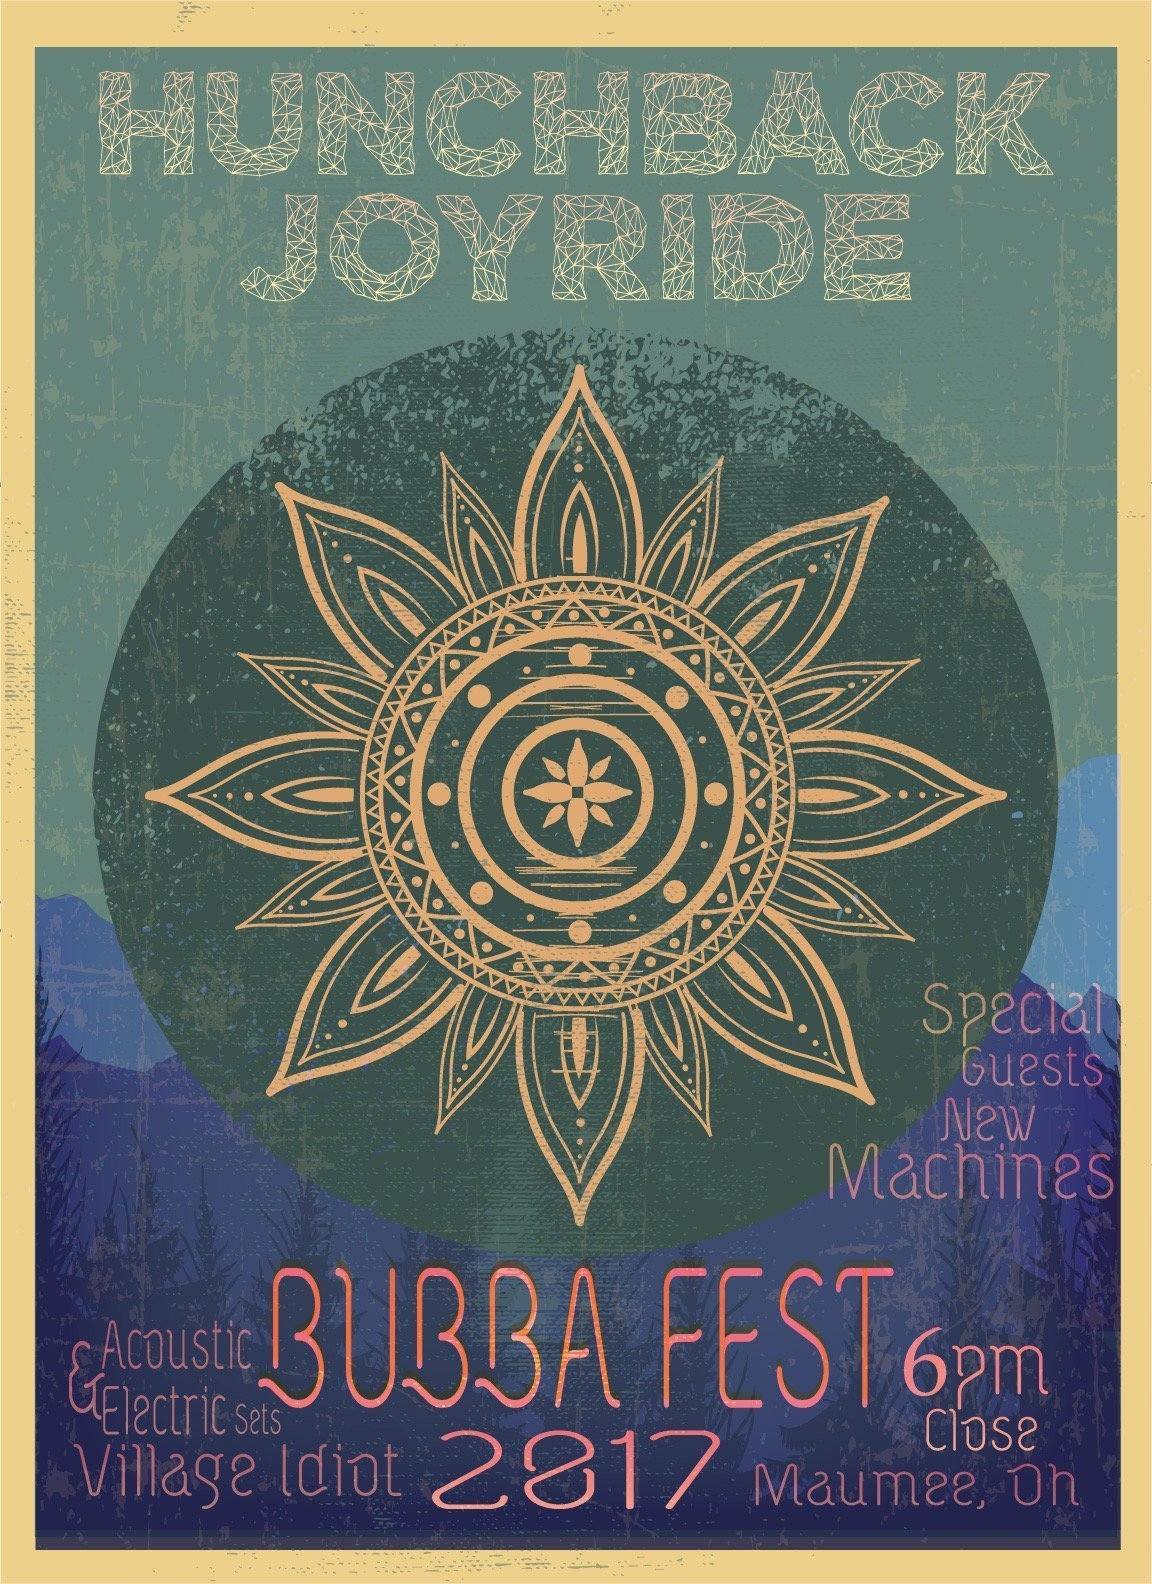 Hunchback Joyride – Bubbafest 2017 Flyer